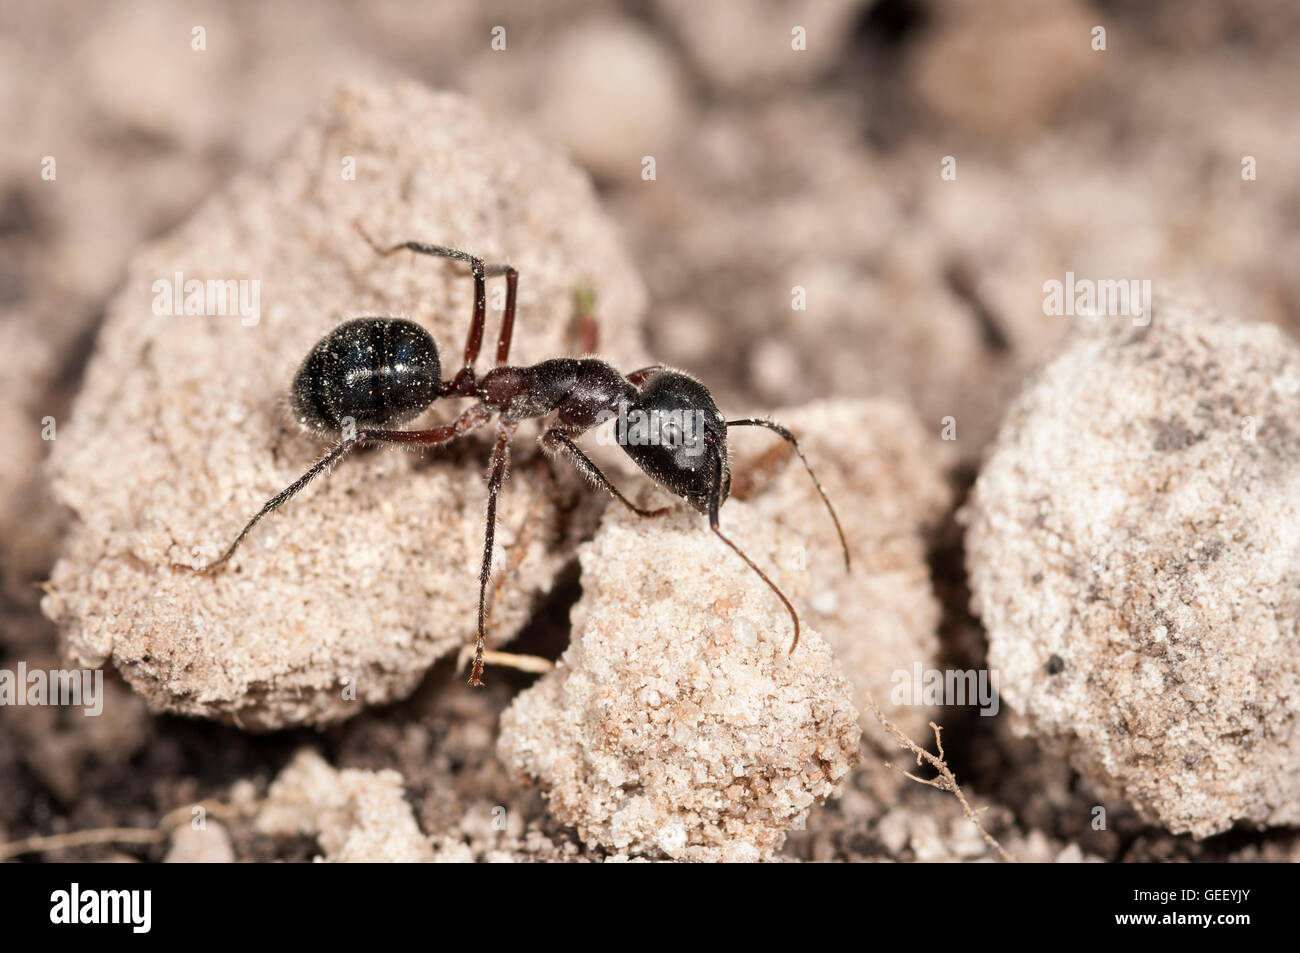 Sugar ant worker (Camponotus sp.) - Stock Image